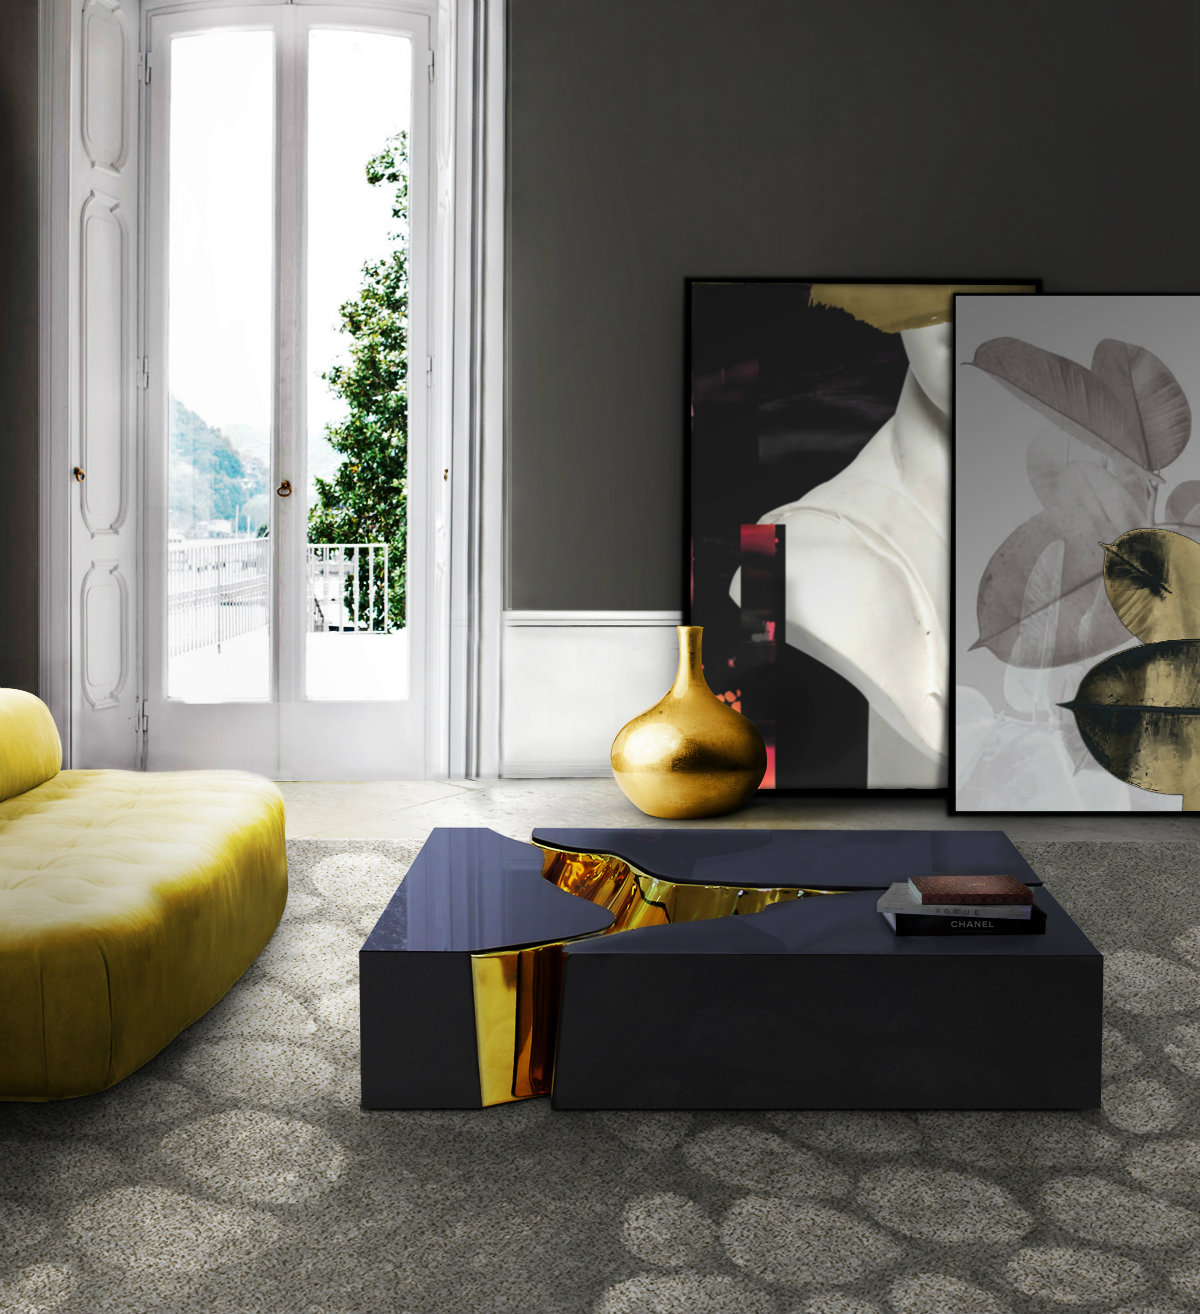 Limited Luxury Center Tables Bespoke Design: 7 Limited Luxury Center Tables lapiaz black